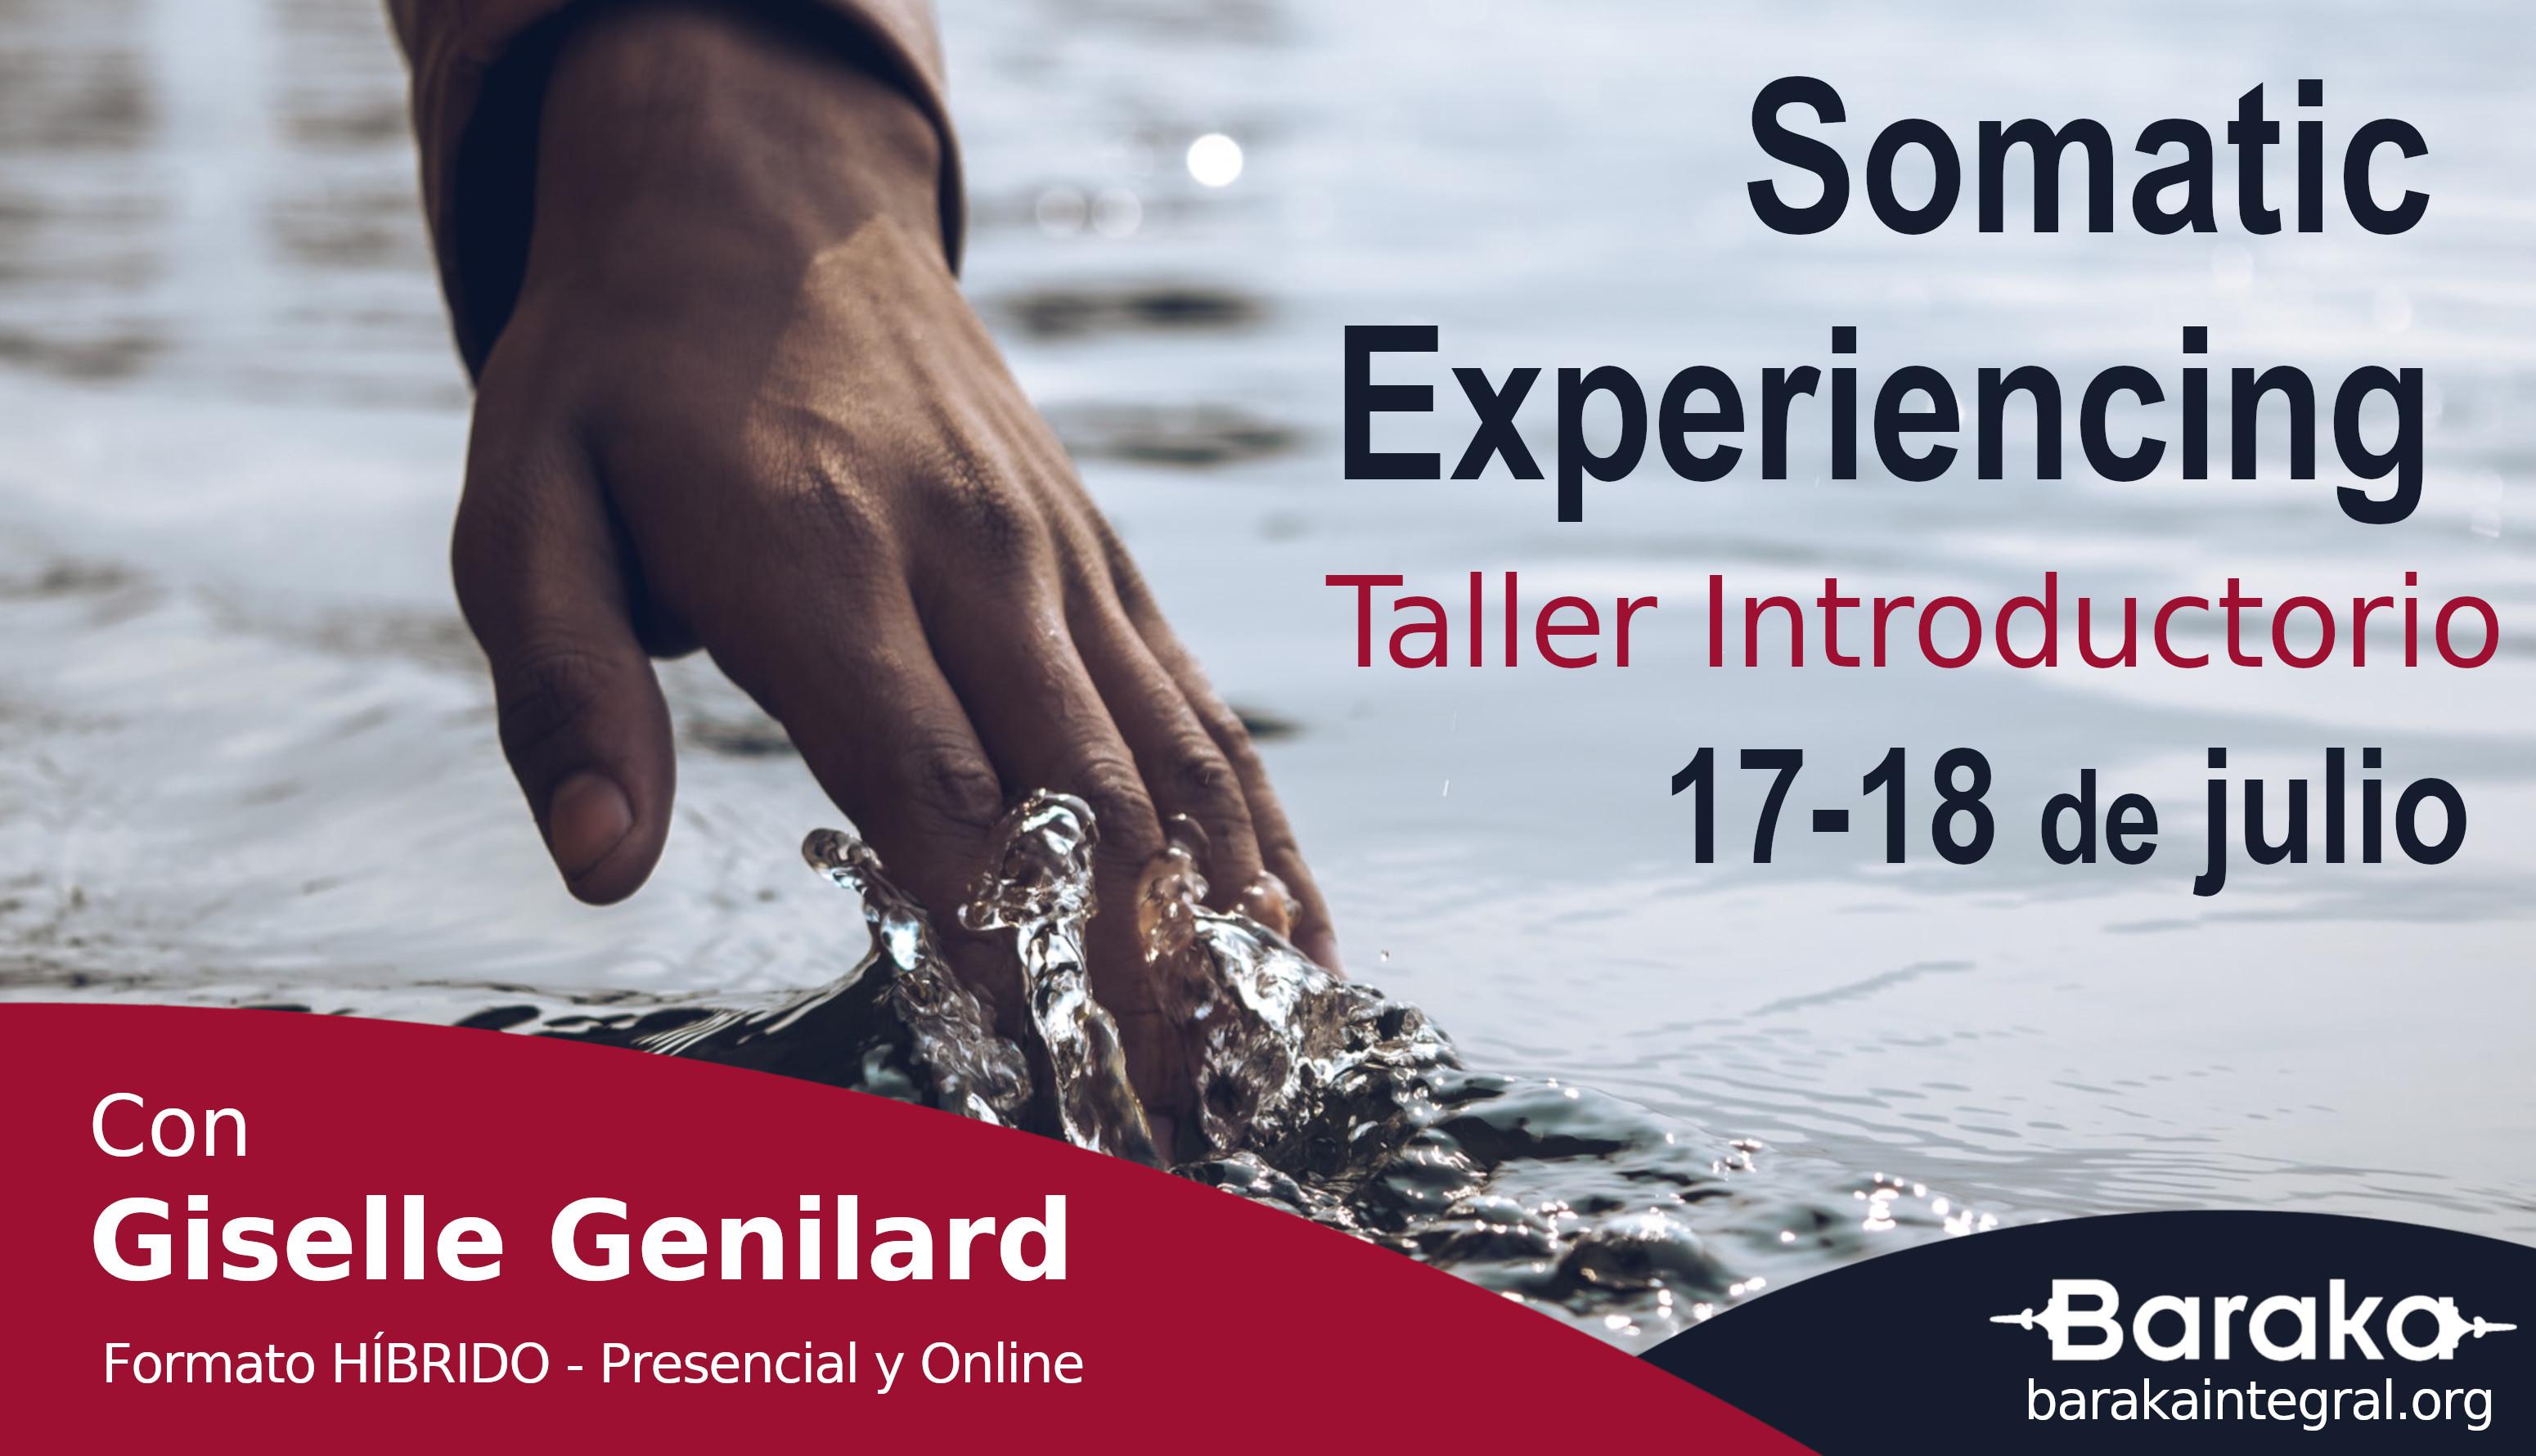 Taller introductorio Somatic Experiencing julio 2021